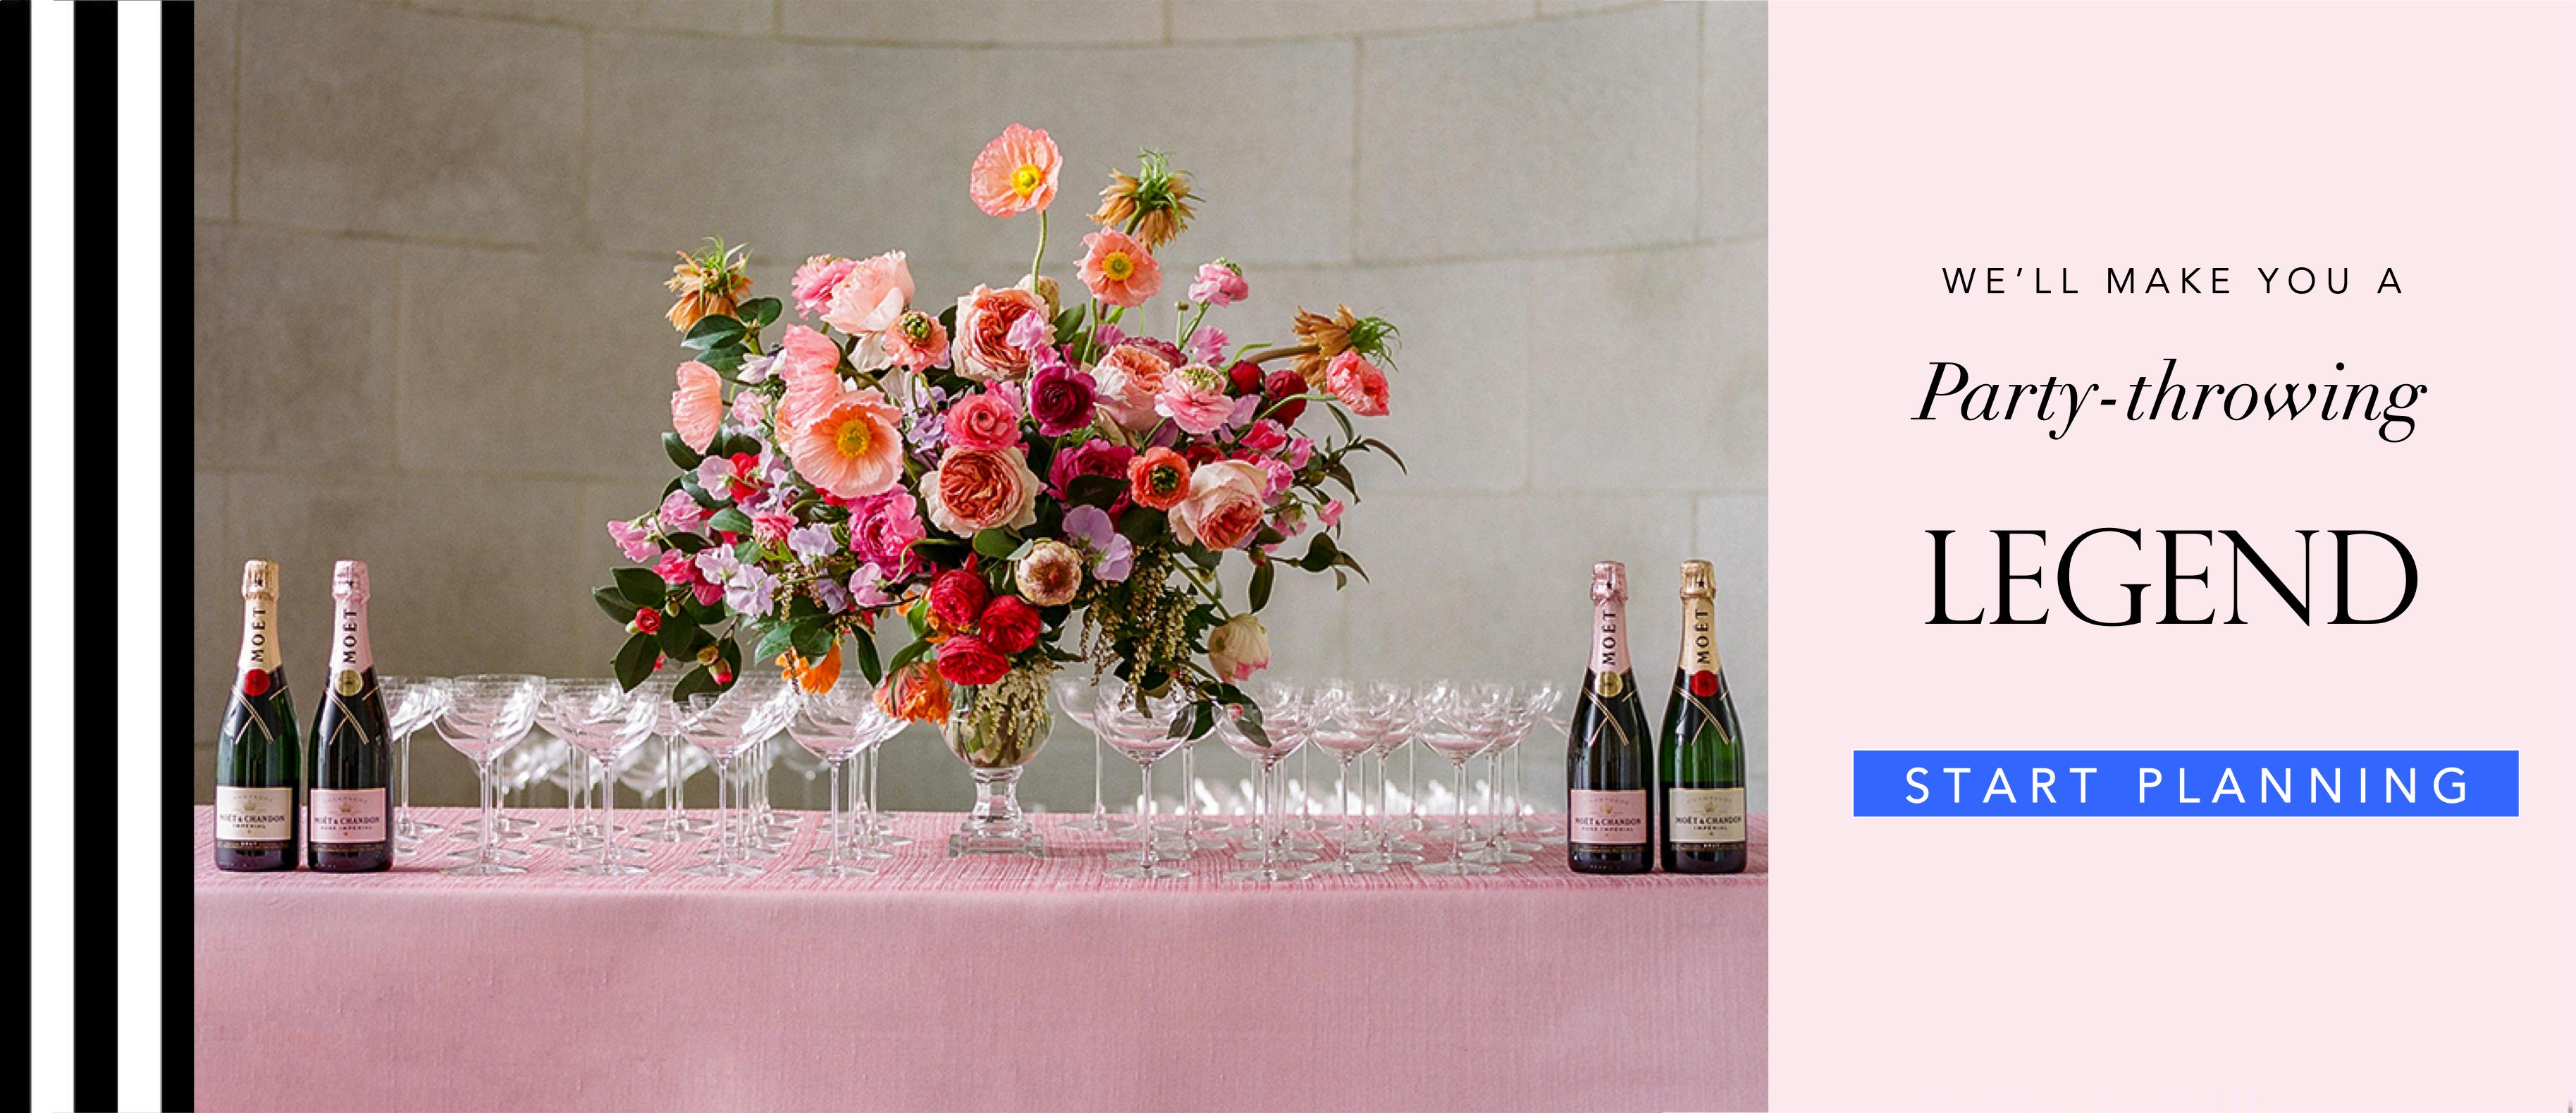 10-angies-floral-designs-texas-el-paso-texas-79912-.png